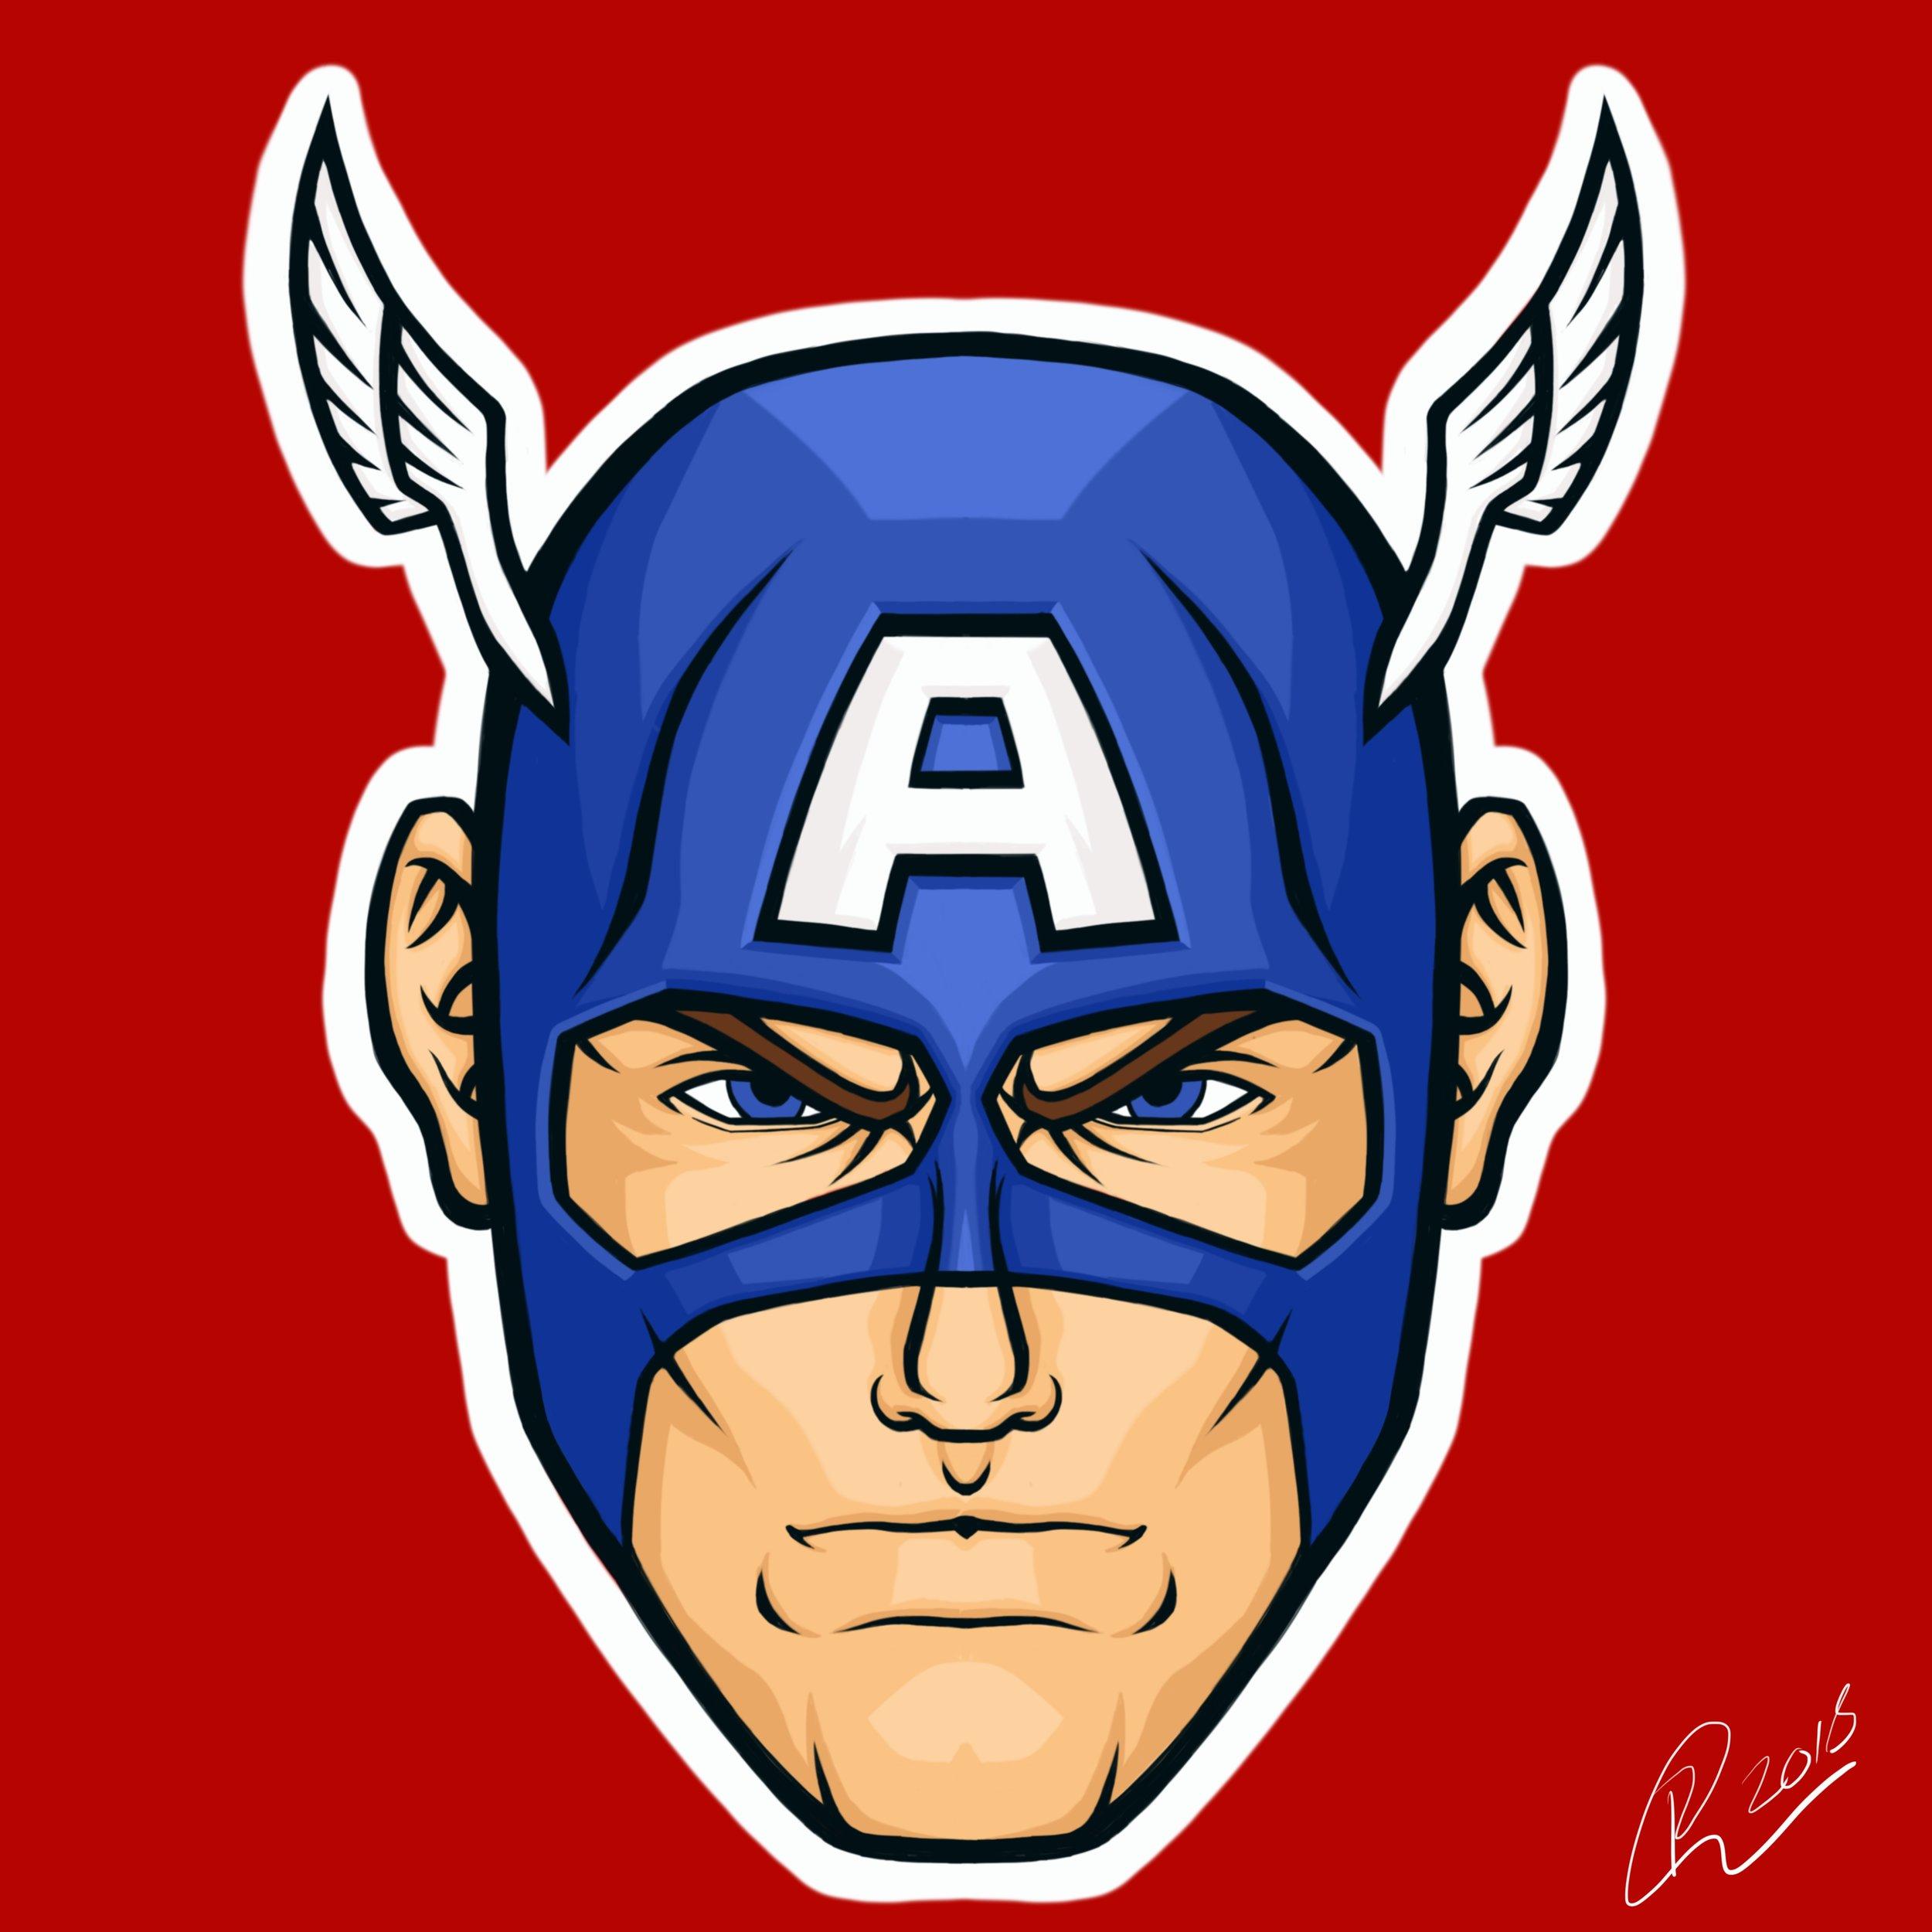 marvel-captain-america-illustration-art-robertoorozco-orozcodesign.JPG